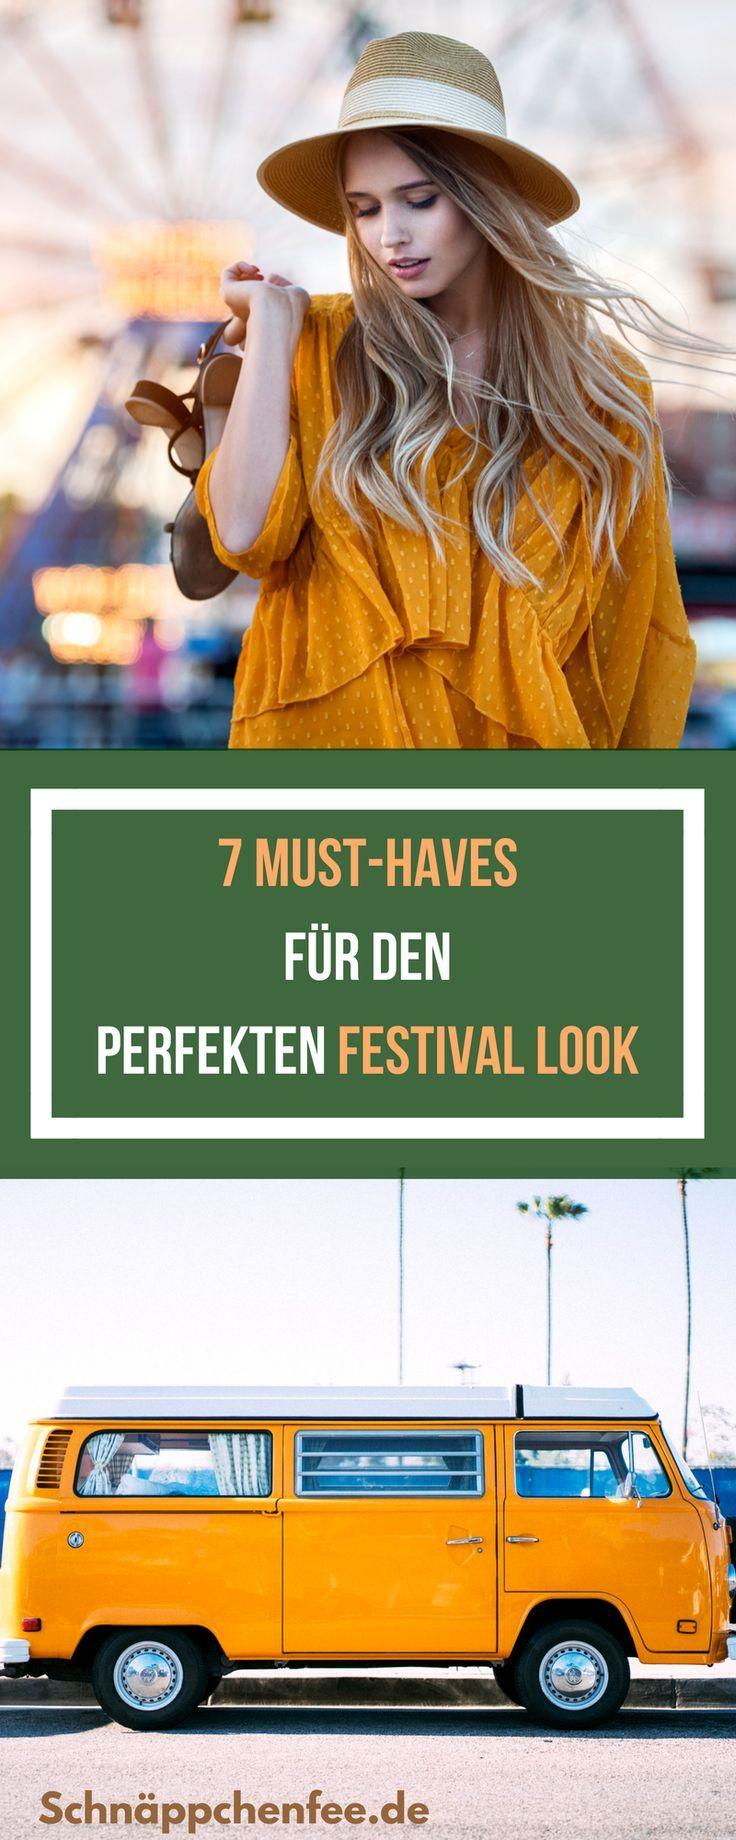 Festival Outfits kombinieren: 7 Must-haves für den Boho Look